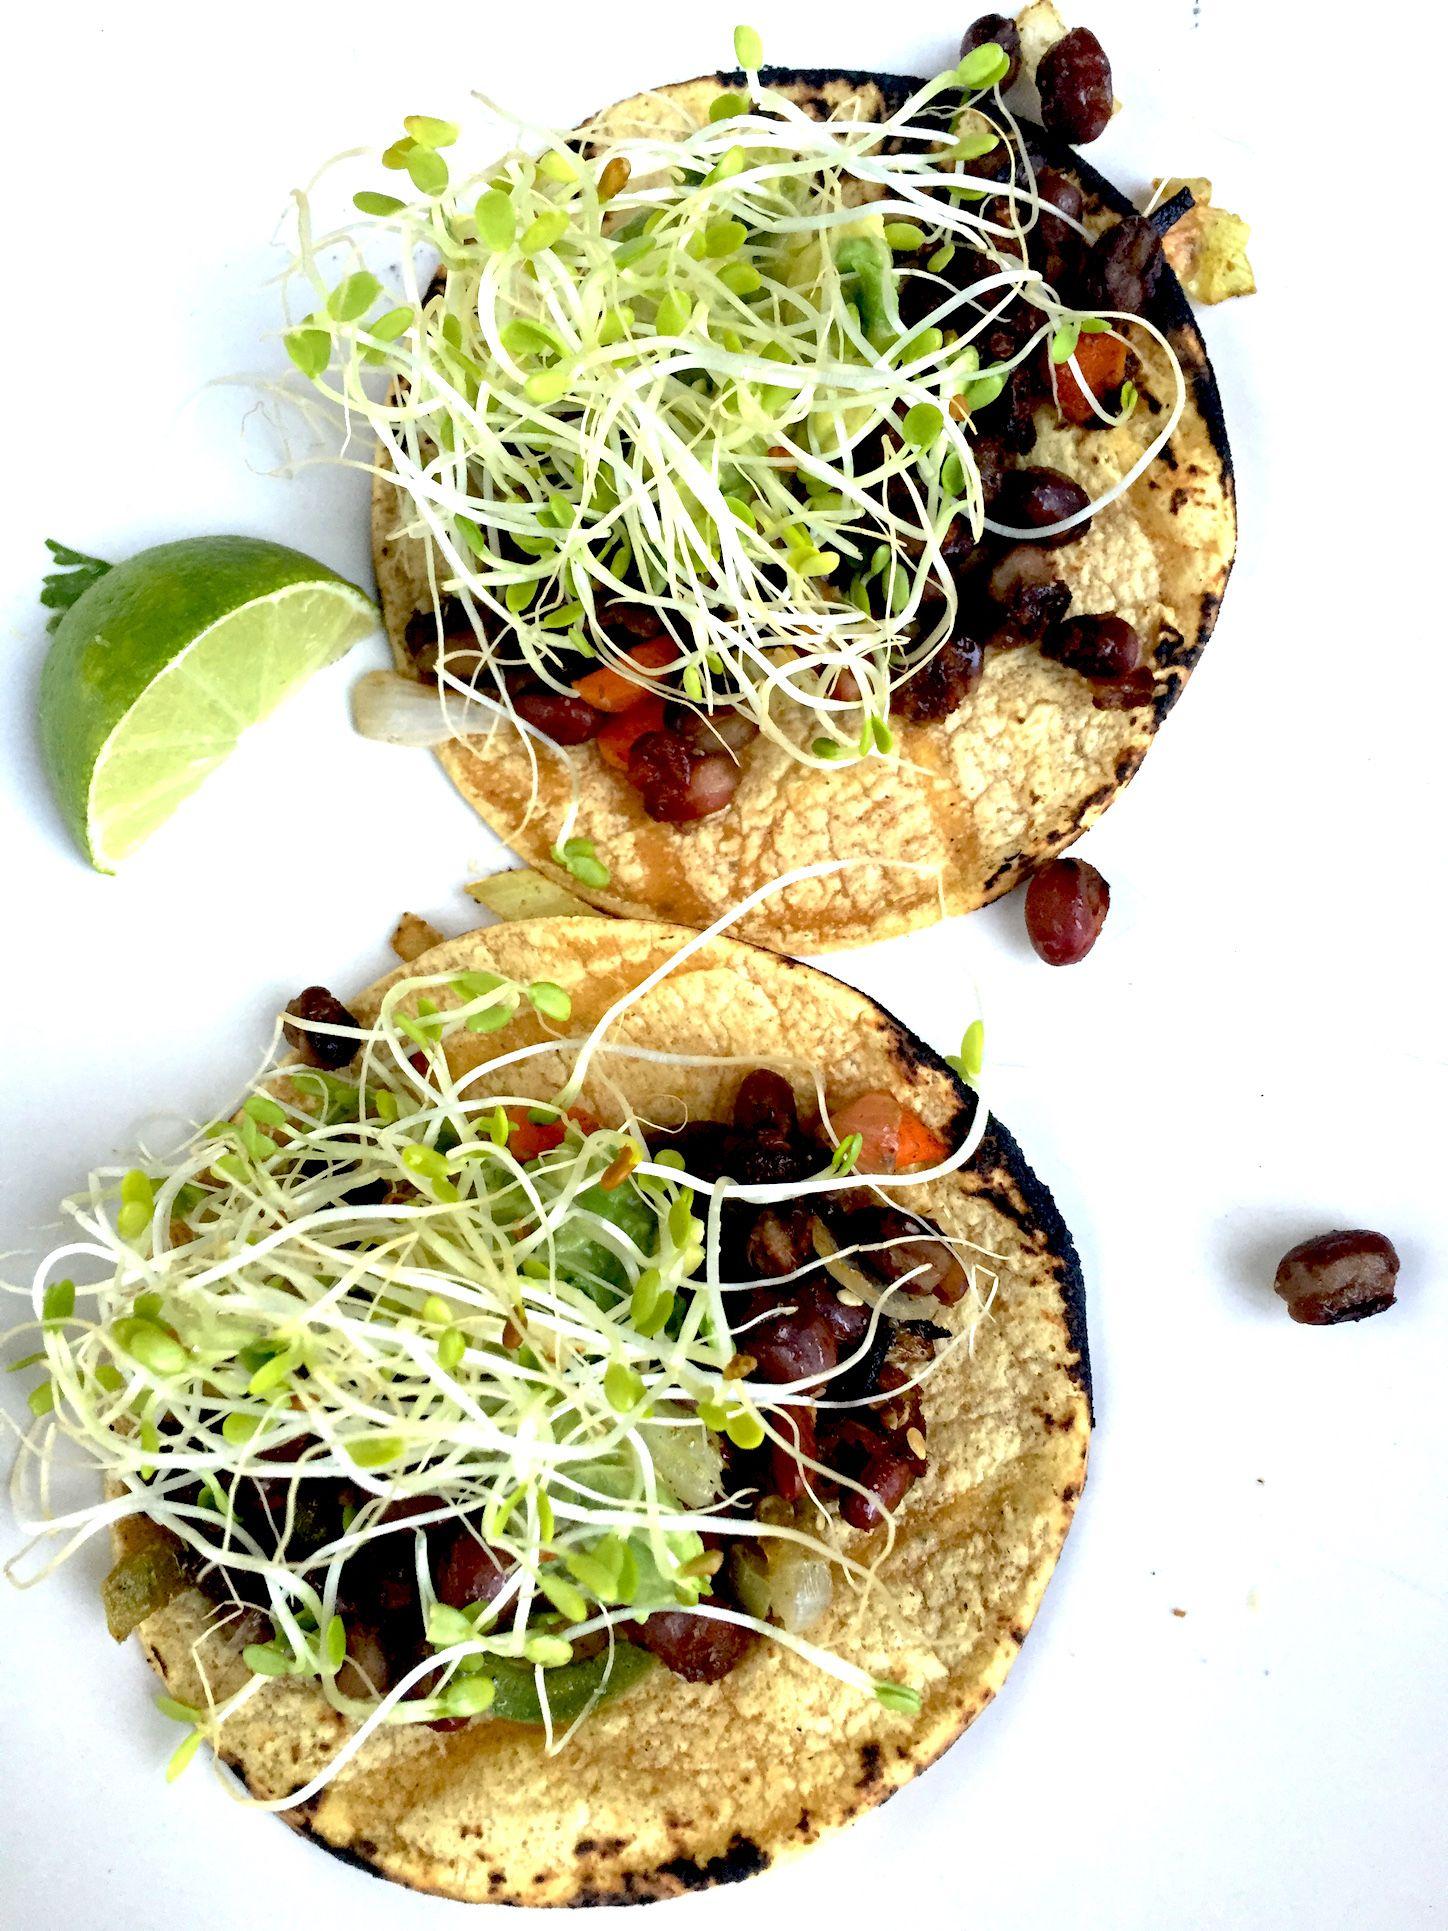 David's Black Bean Tacos, Fresh Cooking, from the Sian Ka'an, near Tulum